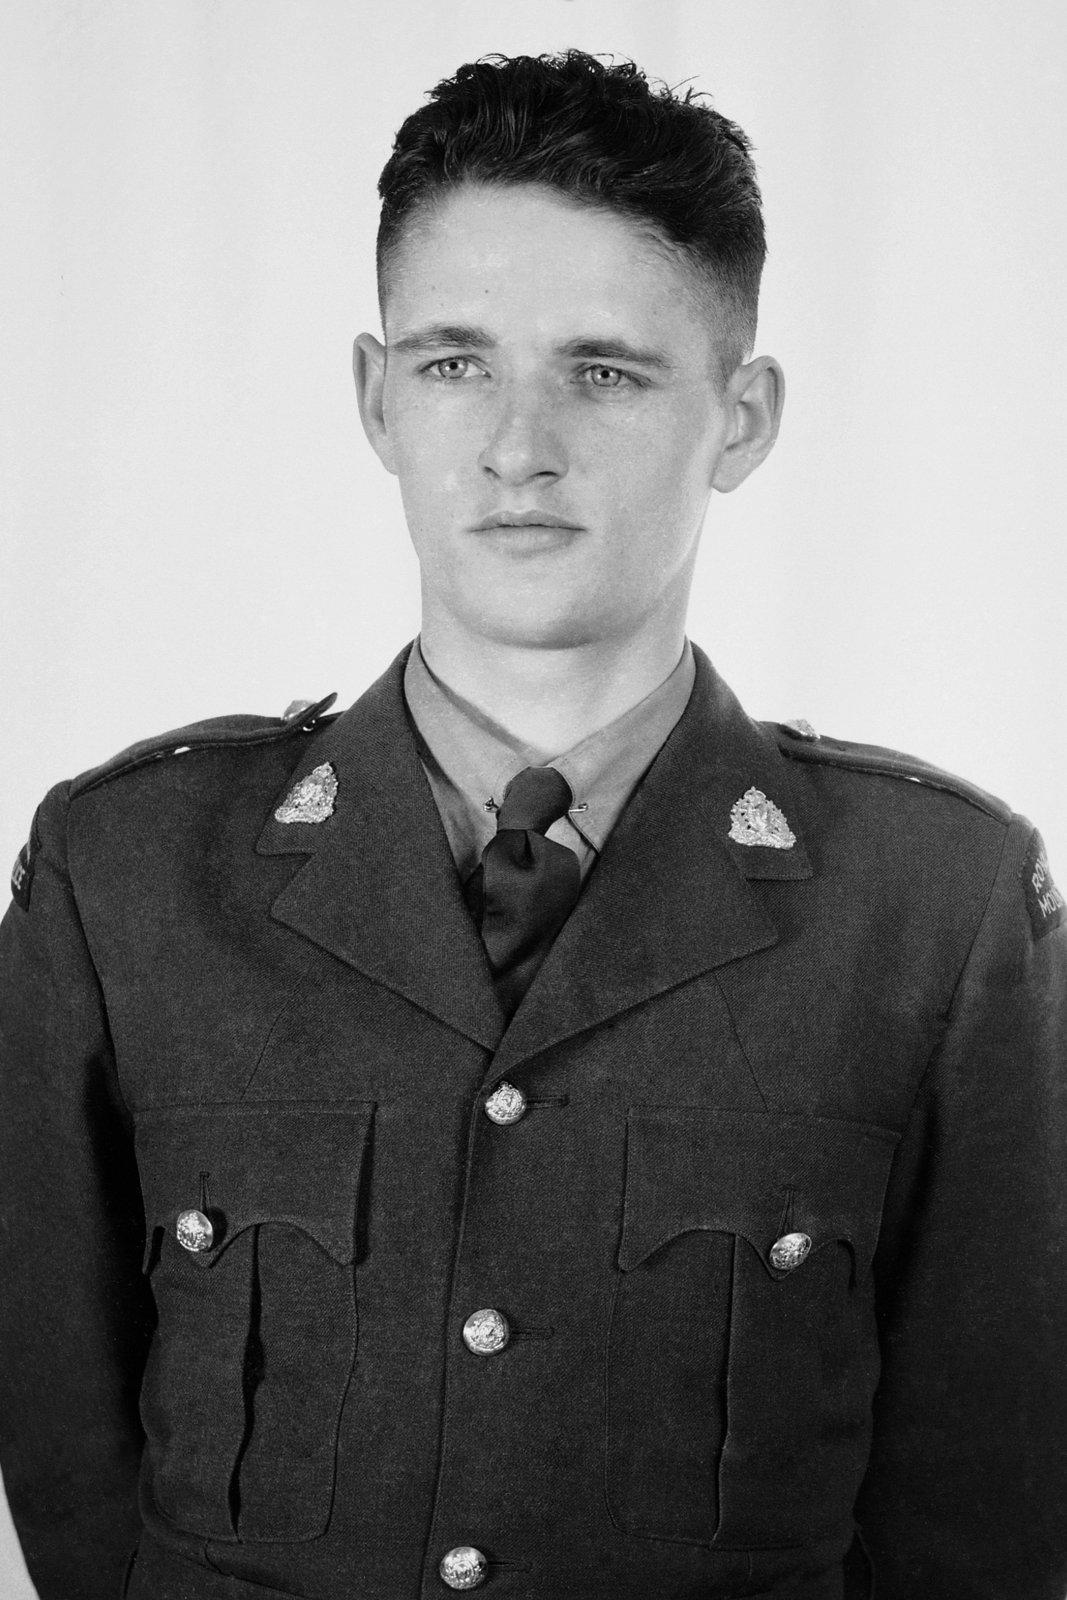 Gendarme Elwood Joseph Keck